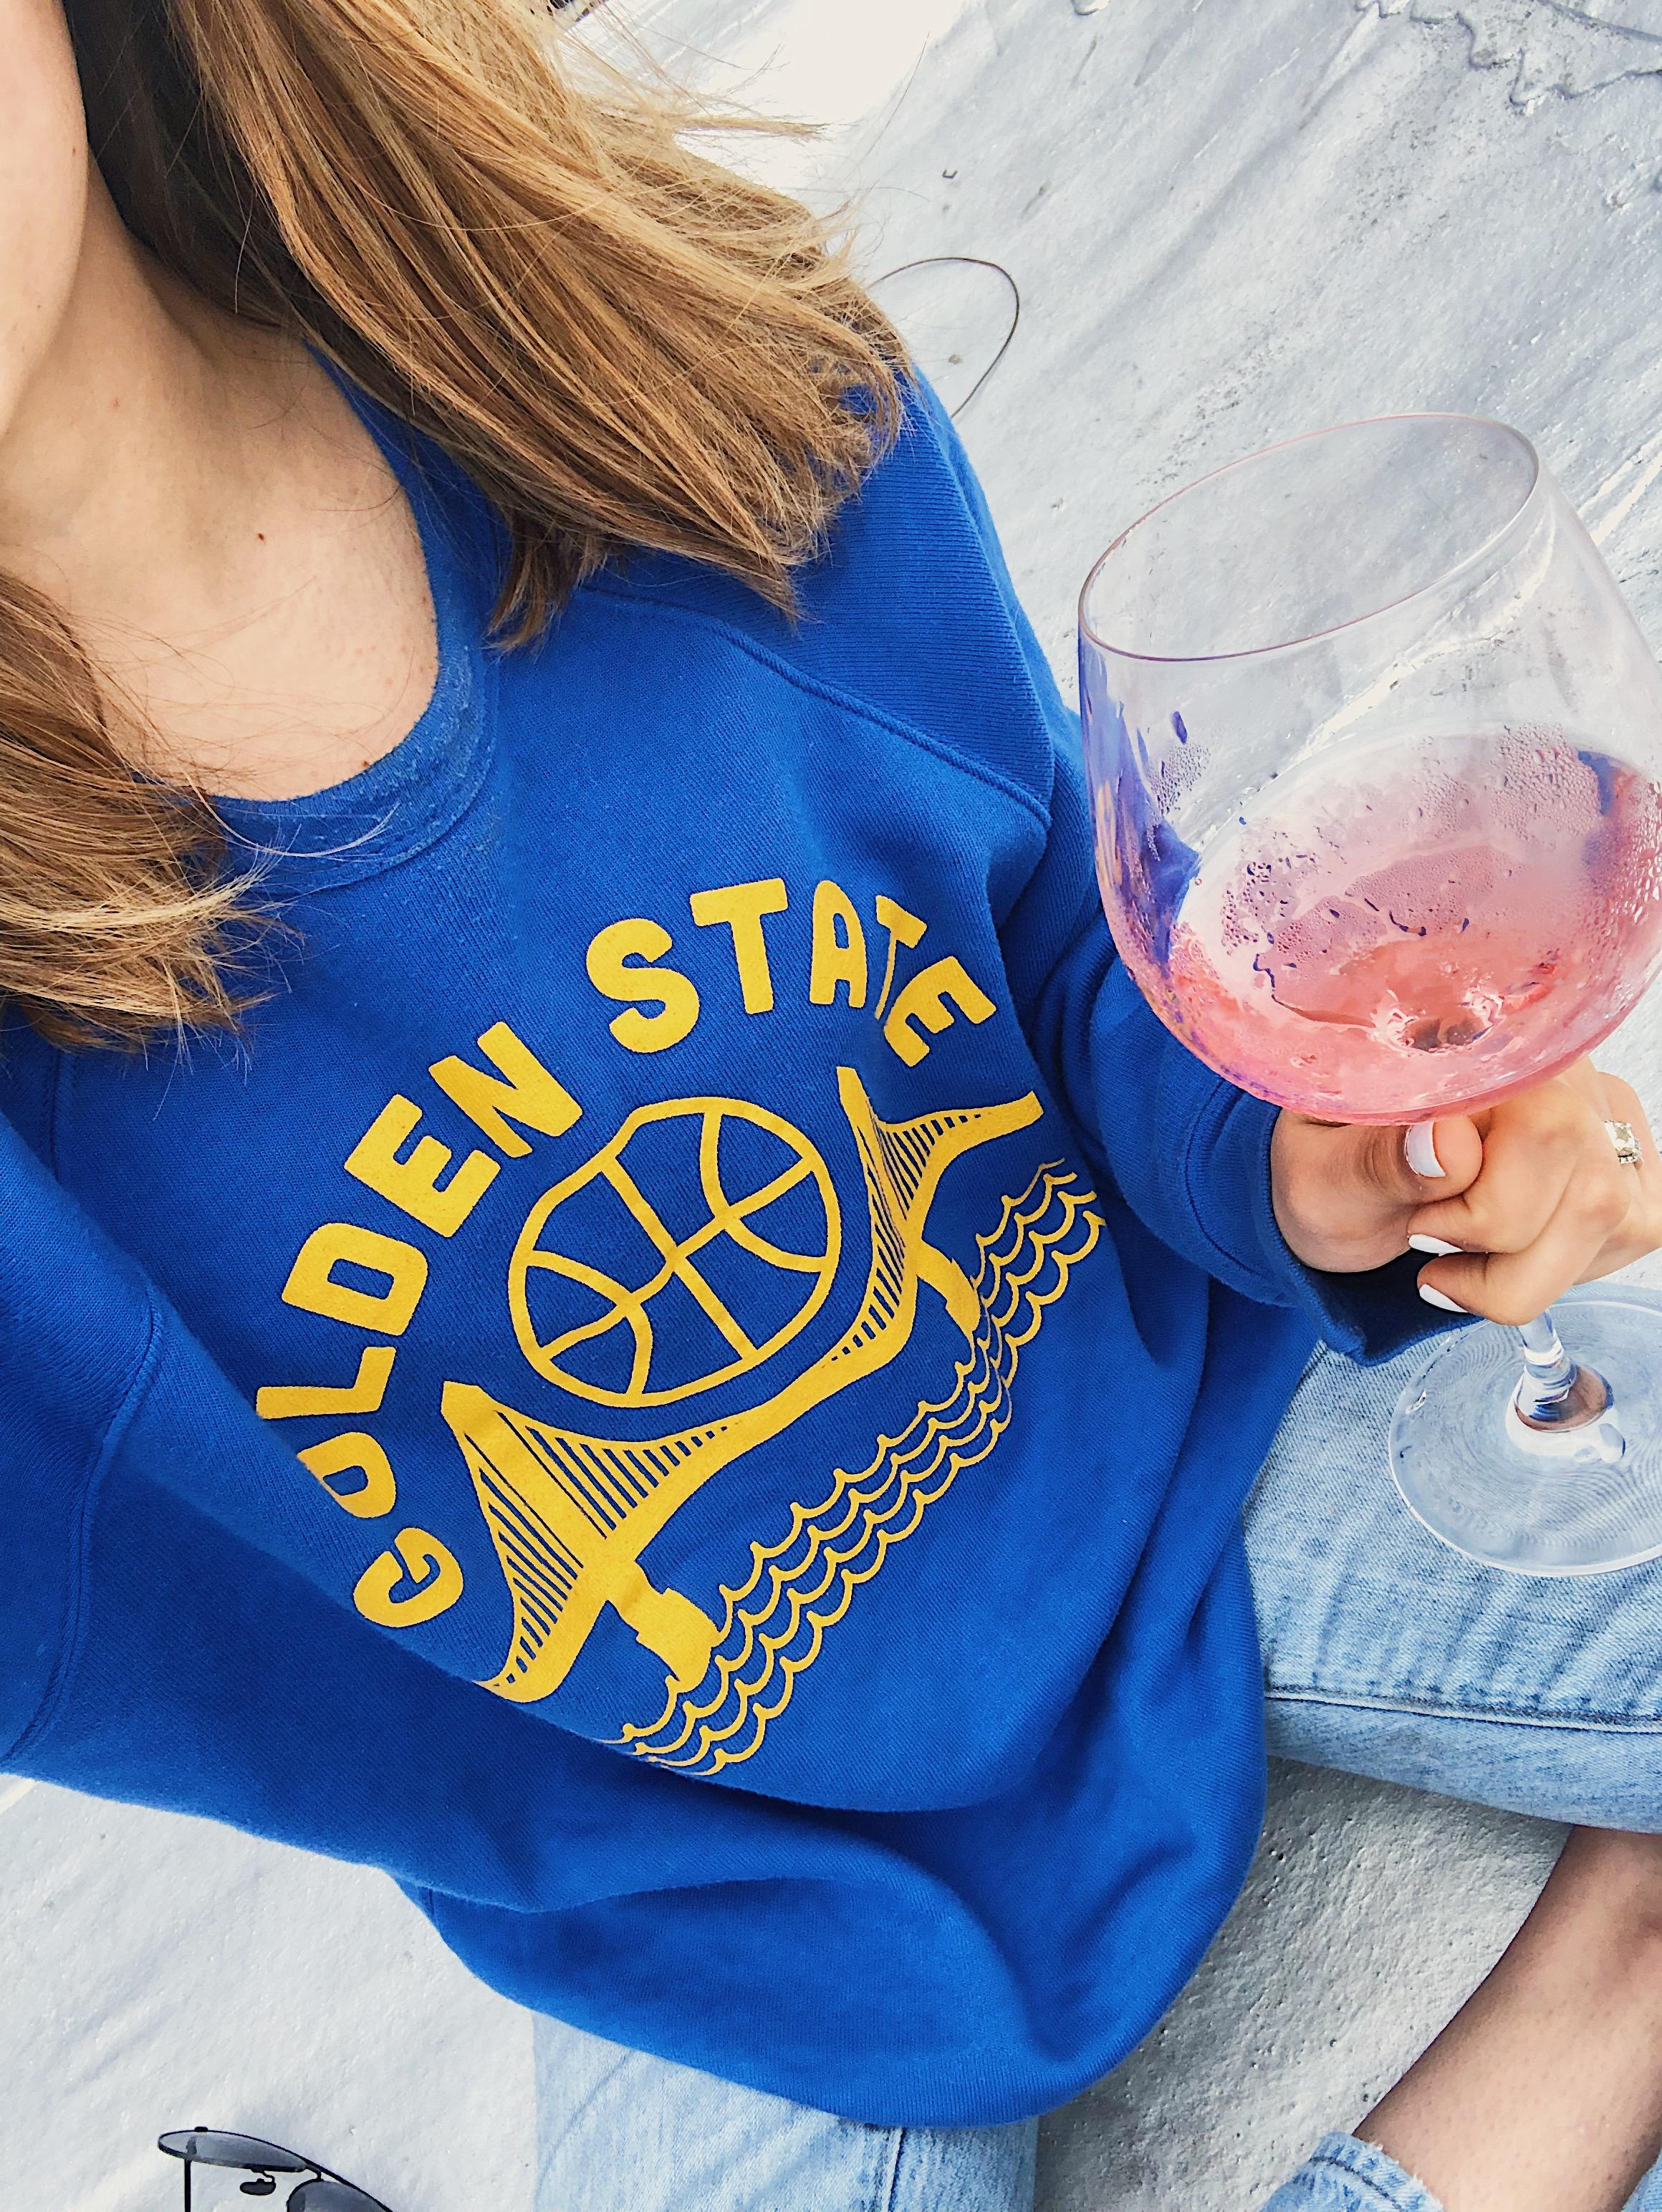 wine-wednesday-dark-horse-wine-review